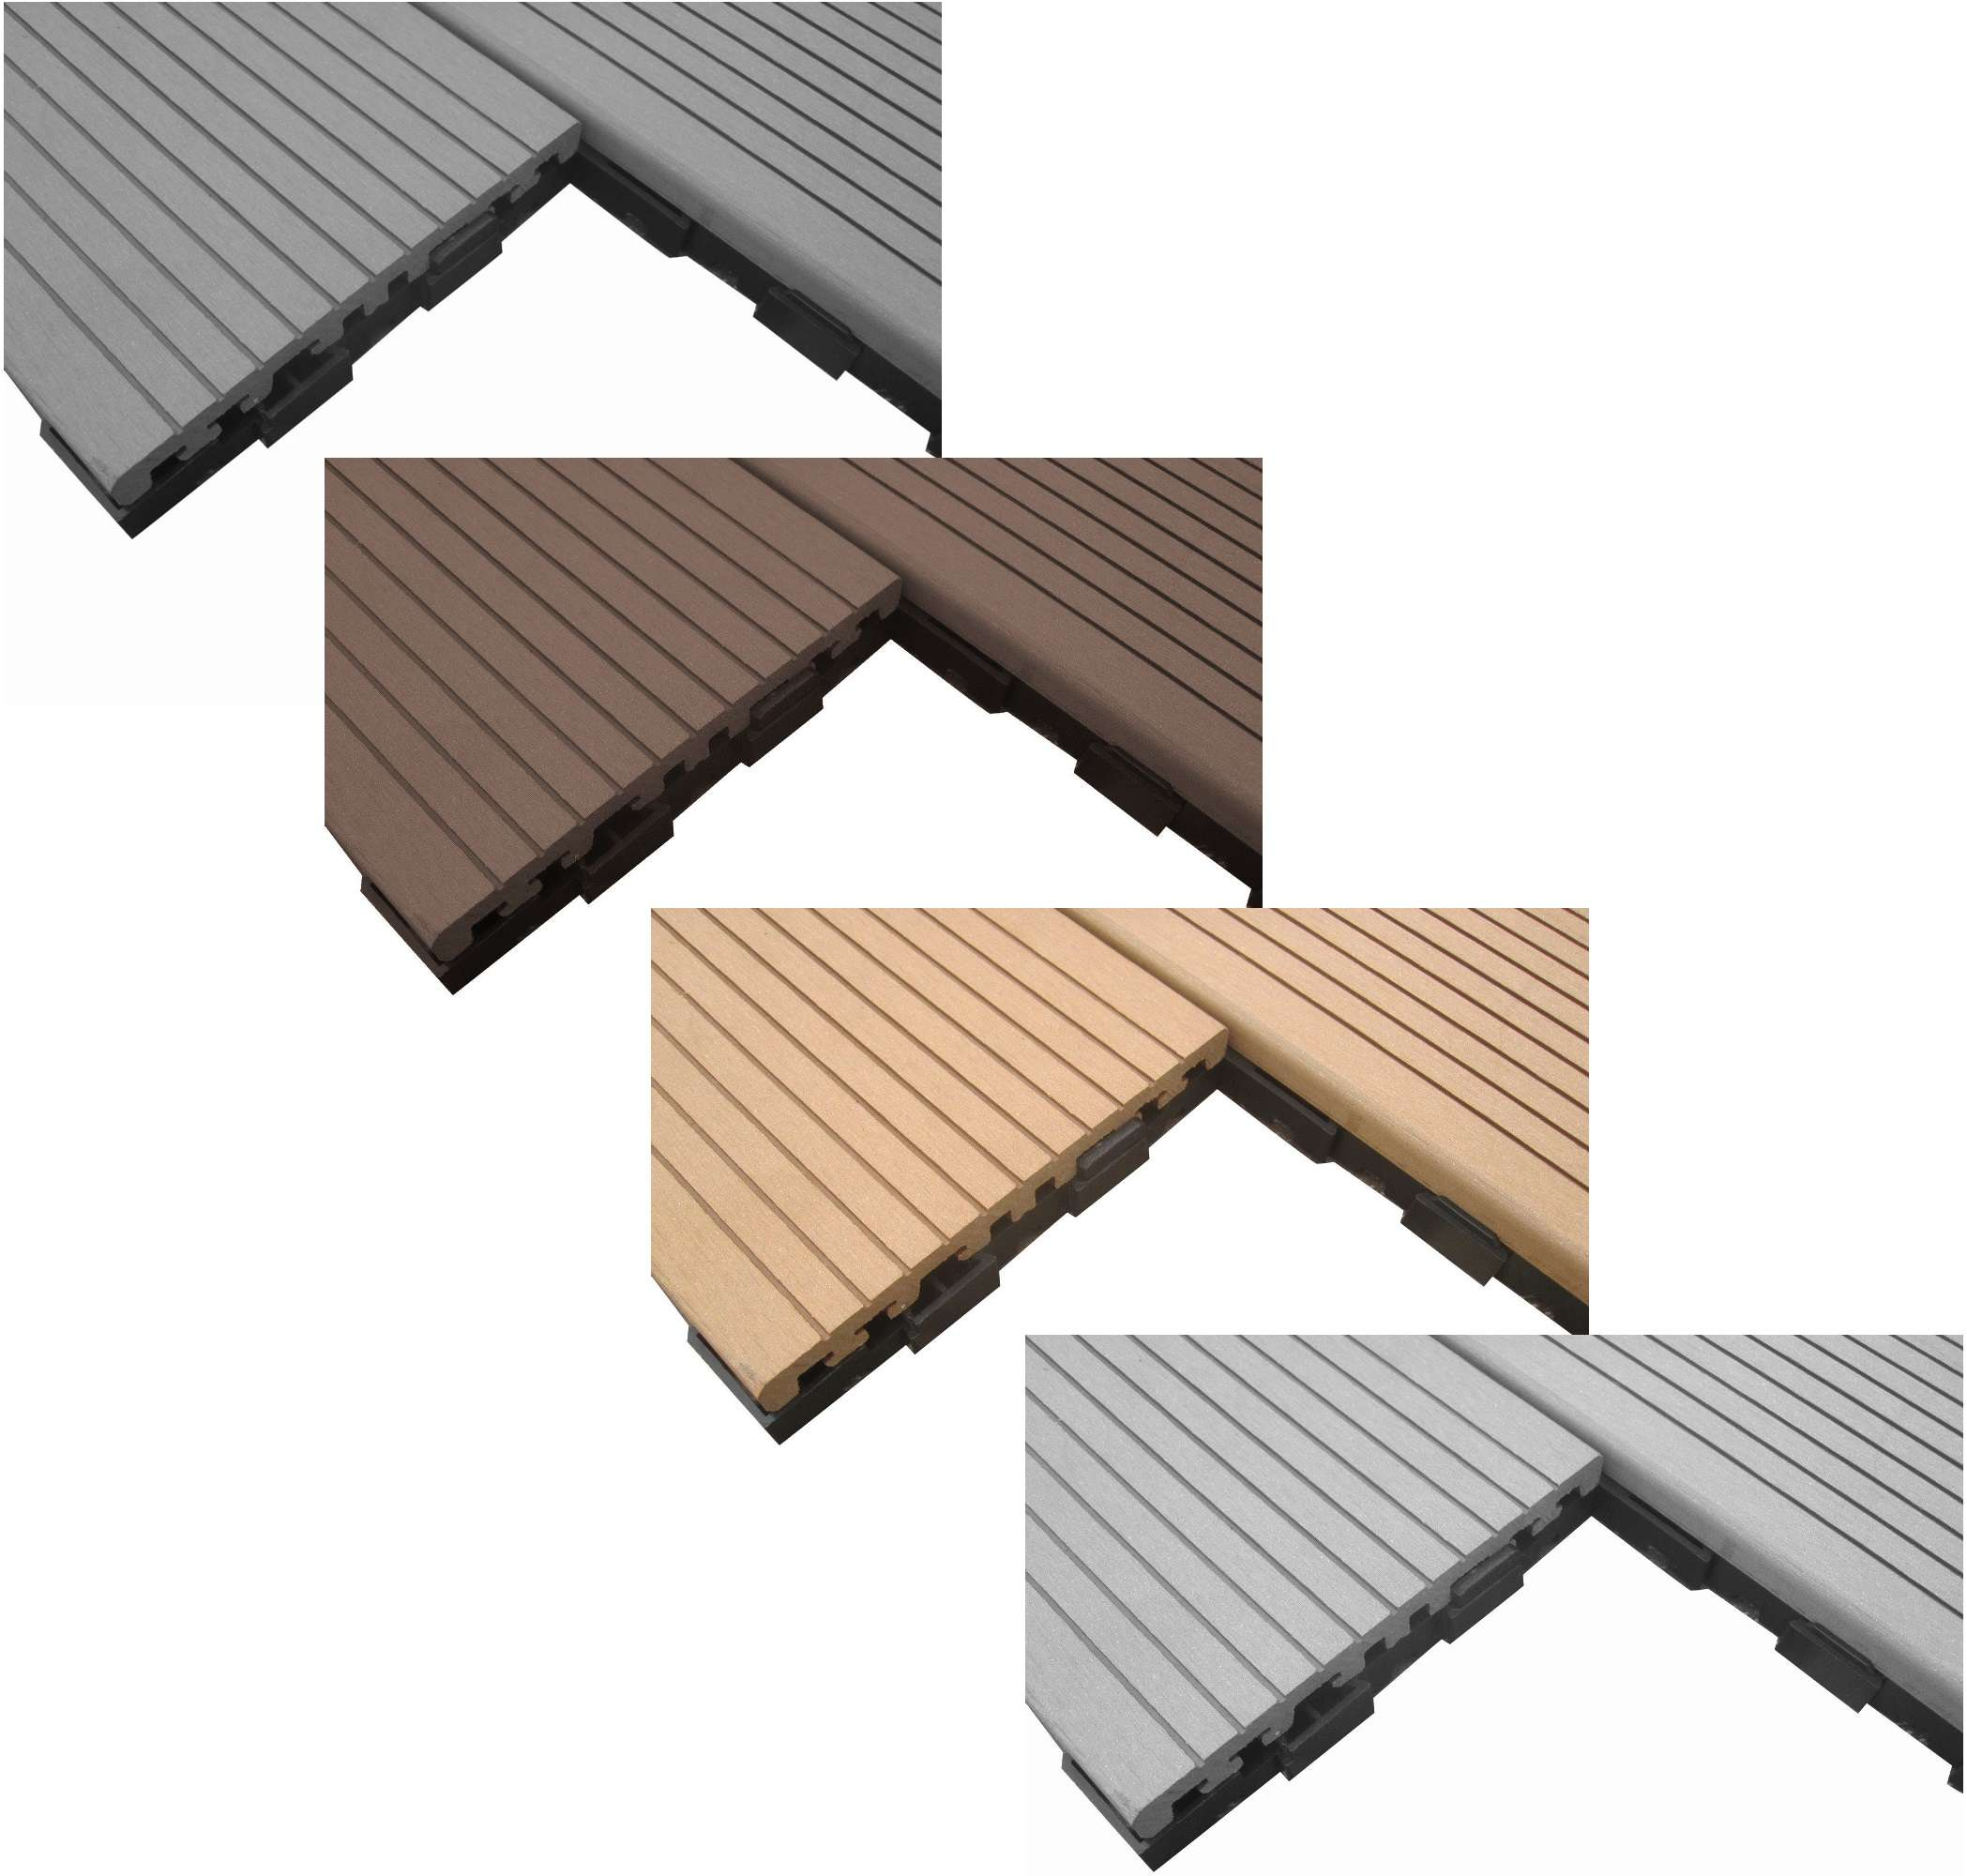 inspiration terrassendielen verlegen anleitung konzept terrasse design ideen. Black Bedroom Furniture Sets. Home Design Ideas